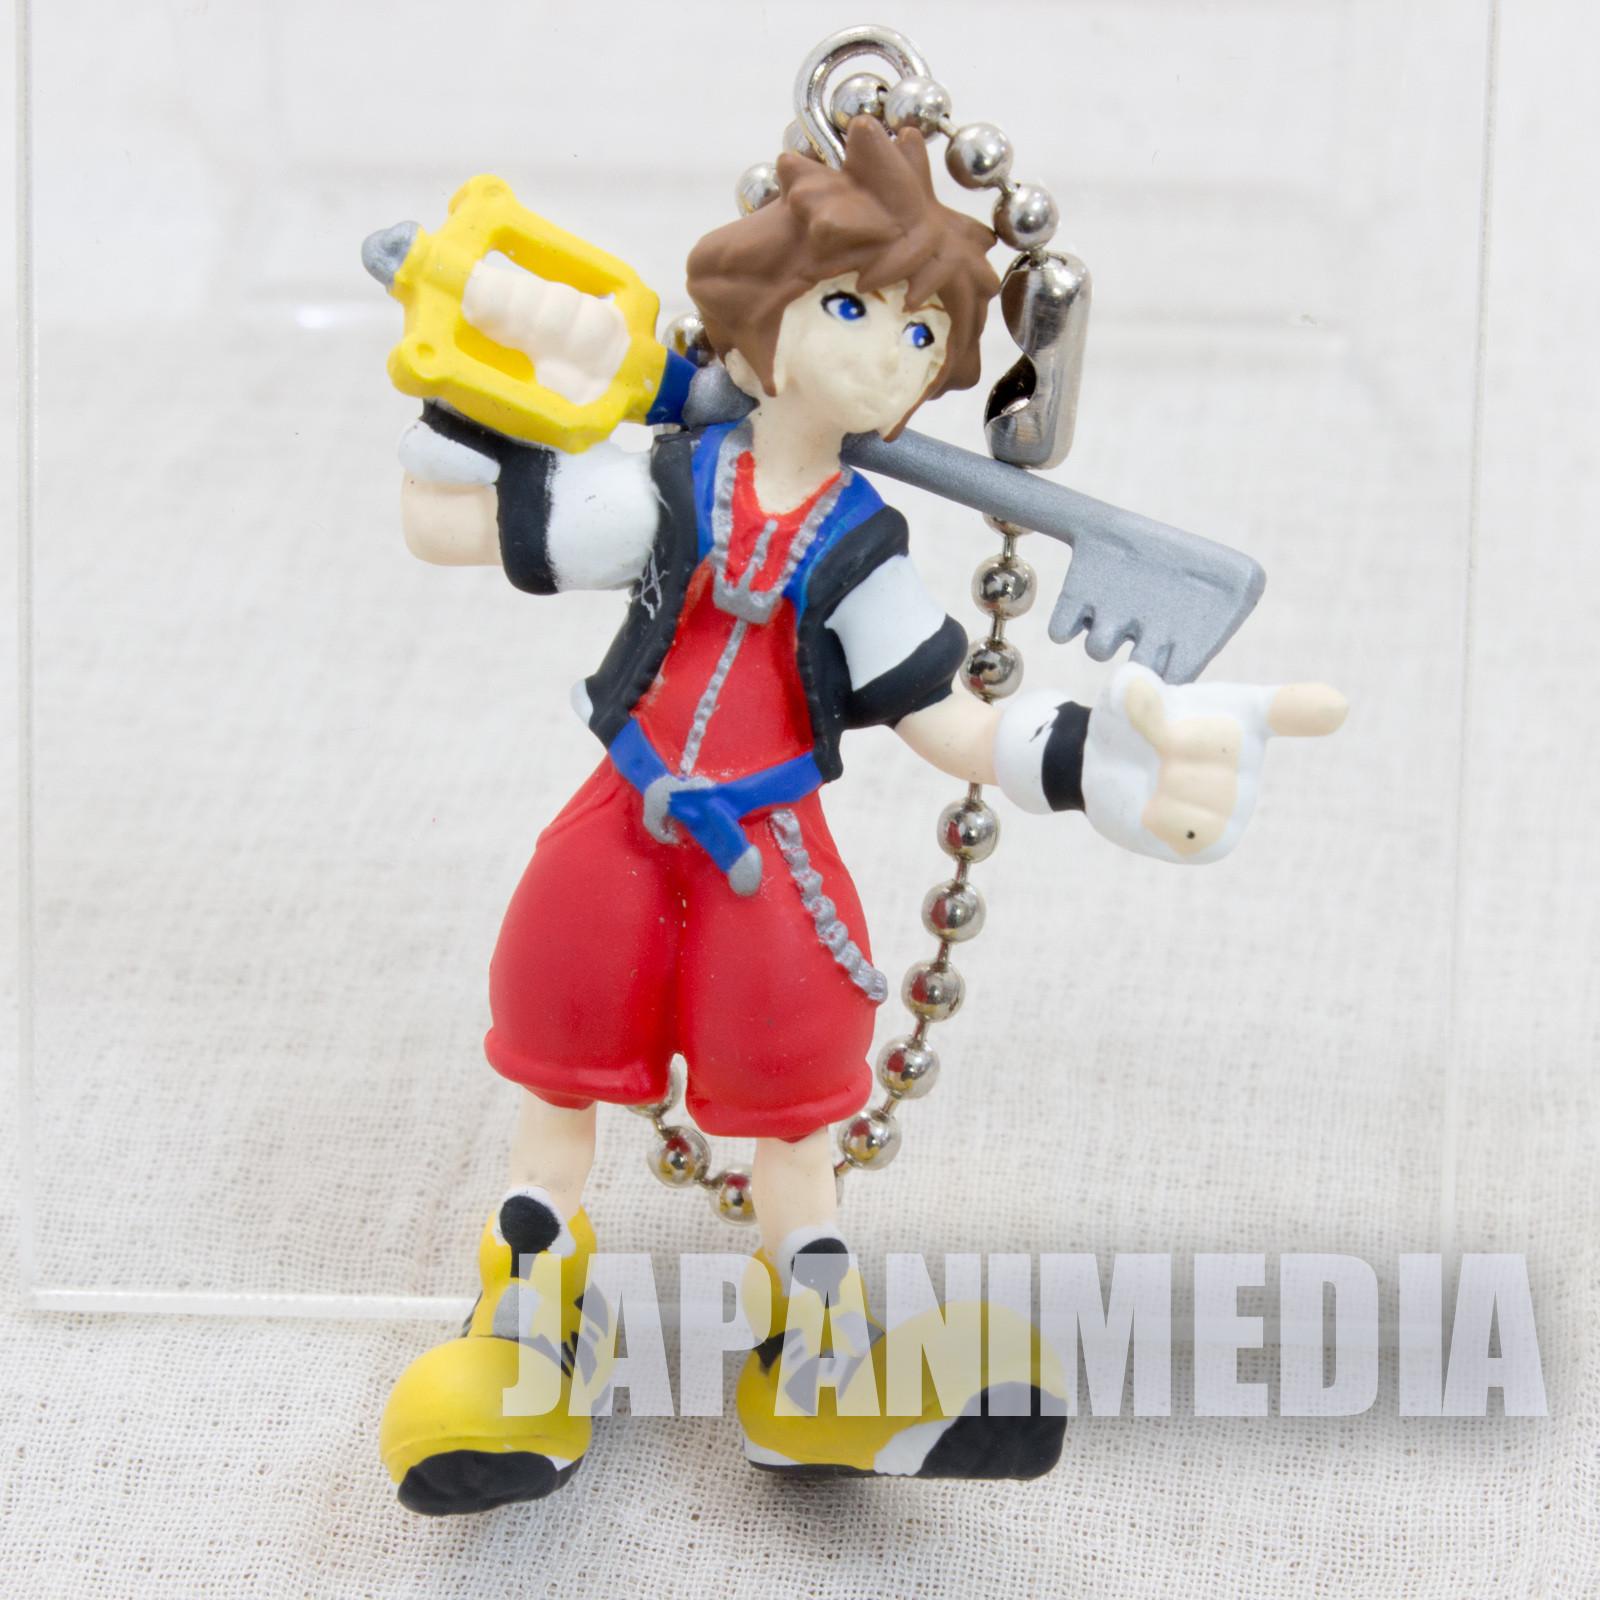 Kingdom Hearts SORA Mini Figure Ballchain Square Enix JAPAN